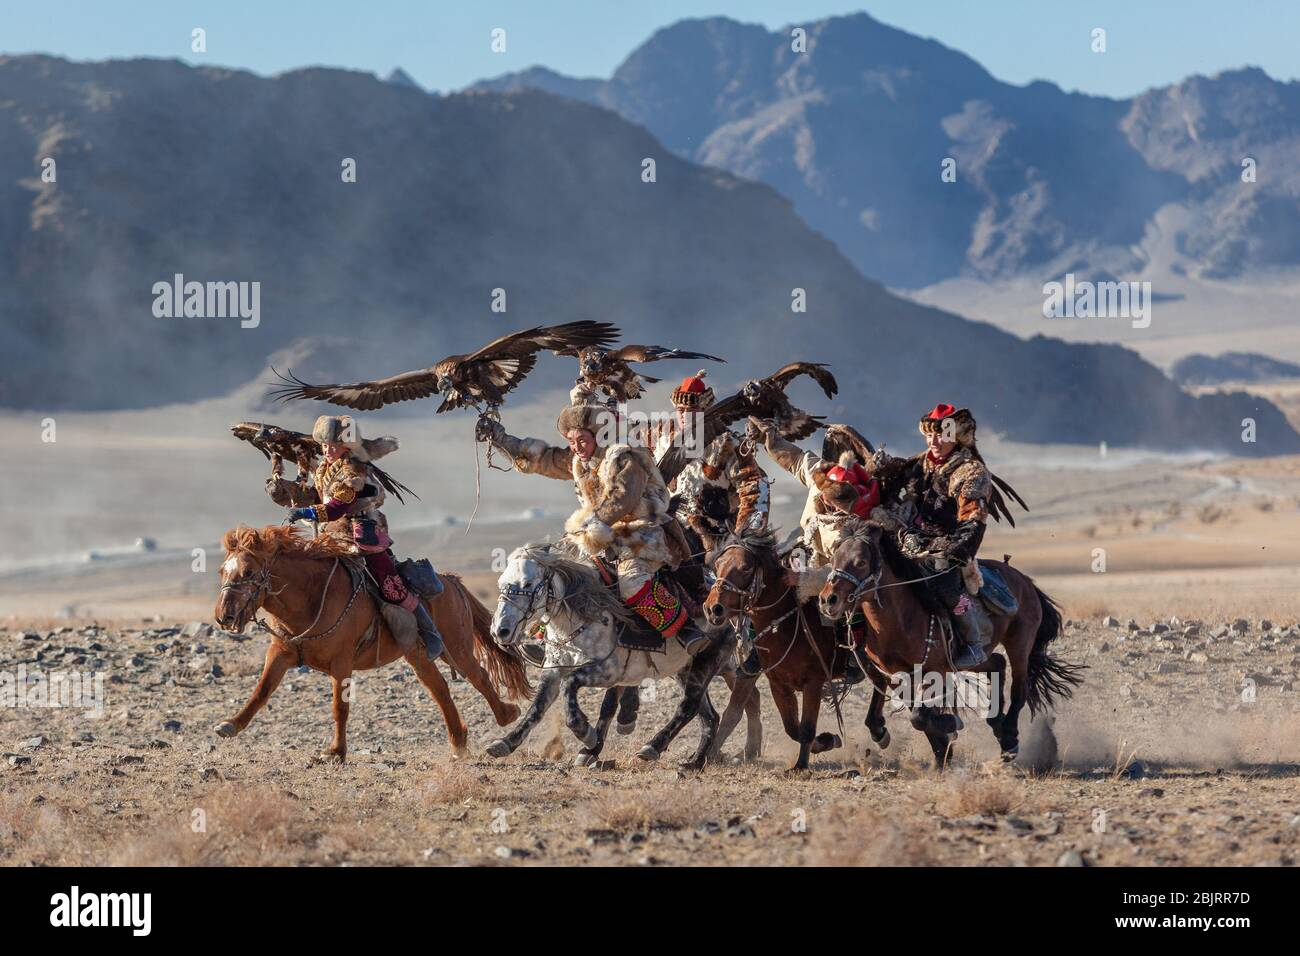 Ulgii, Mongolia : Festival del águila dorada tradicional kazajo nomada juegos Foto de stock